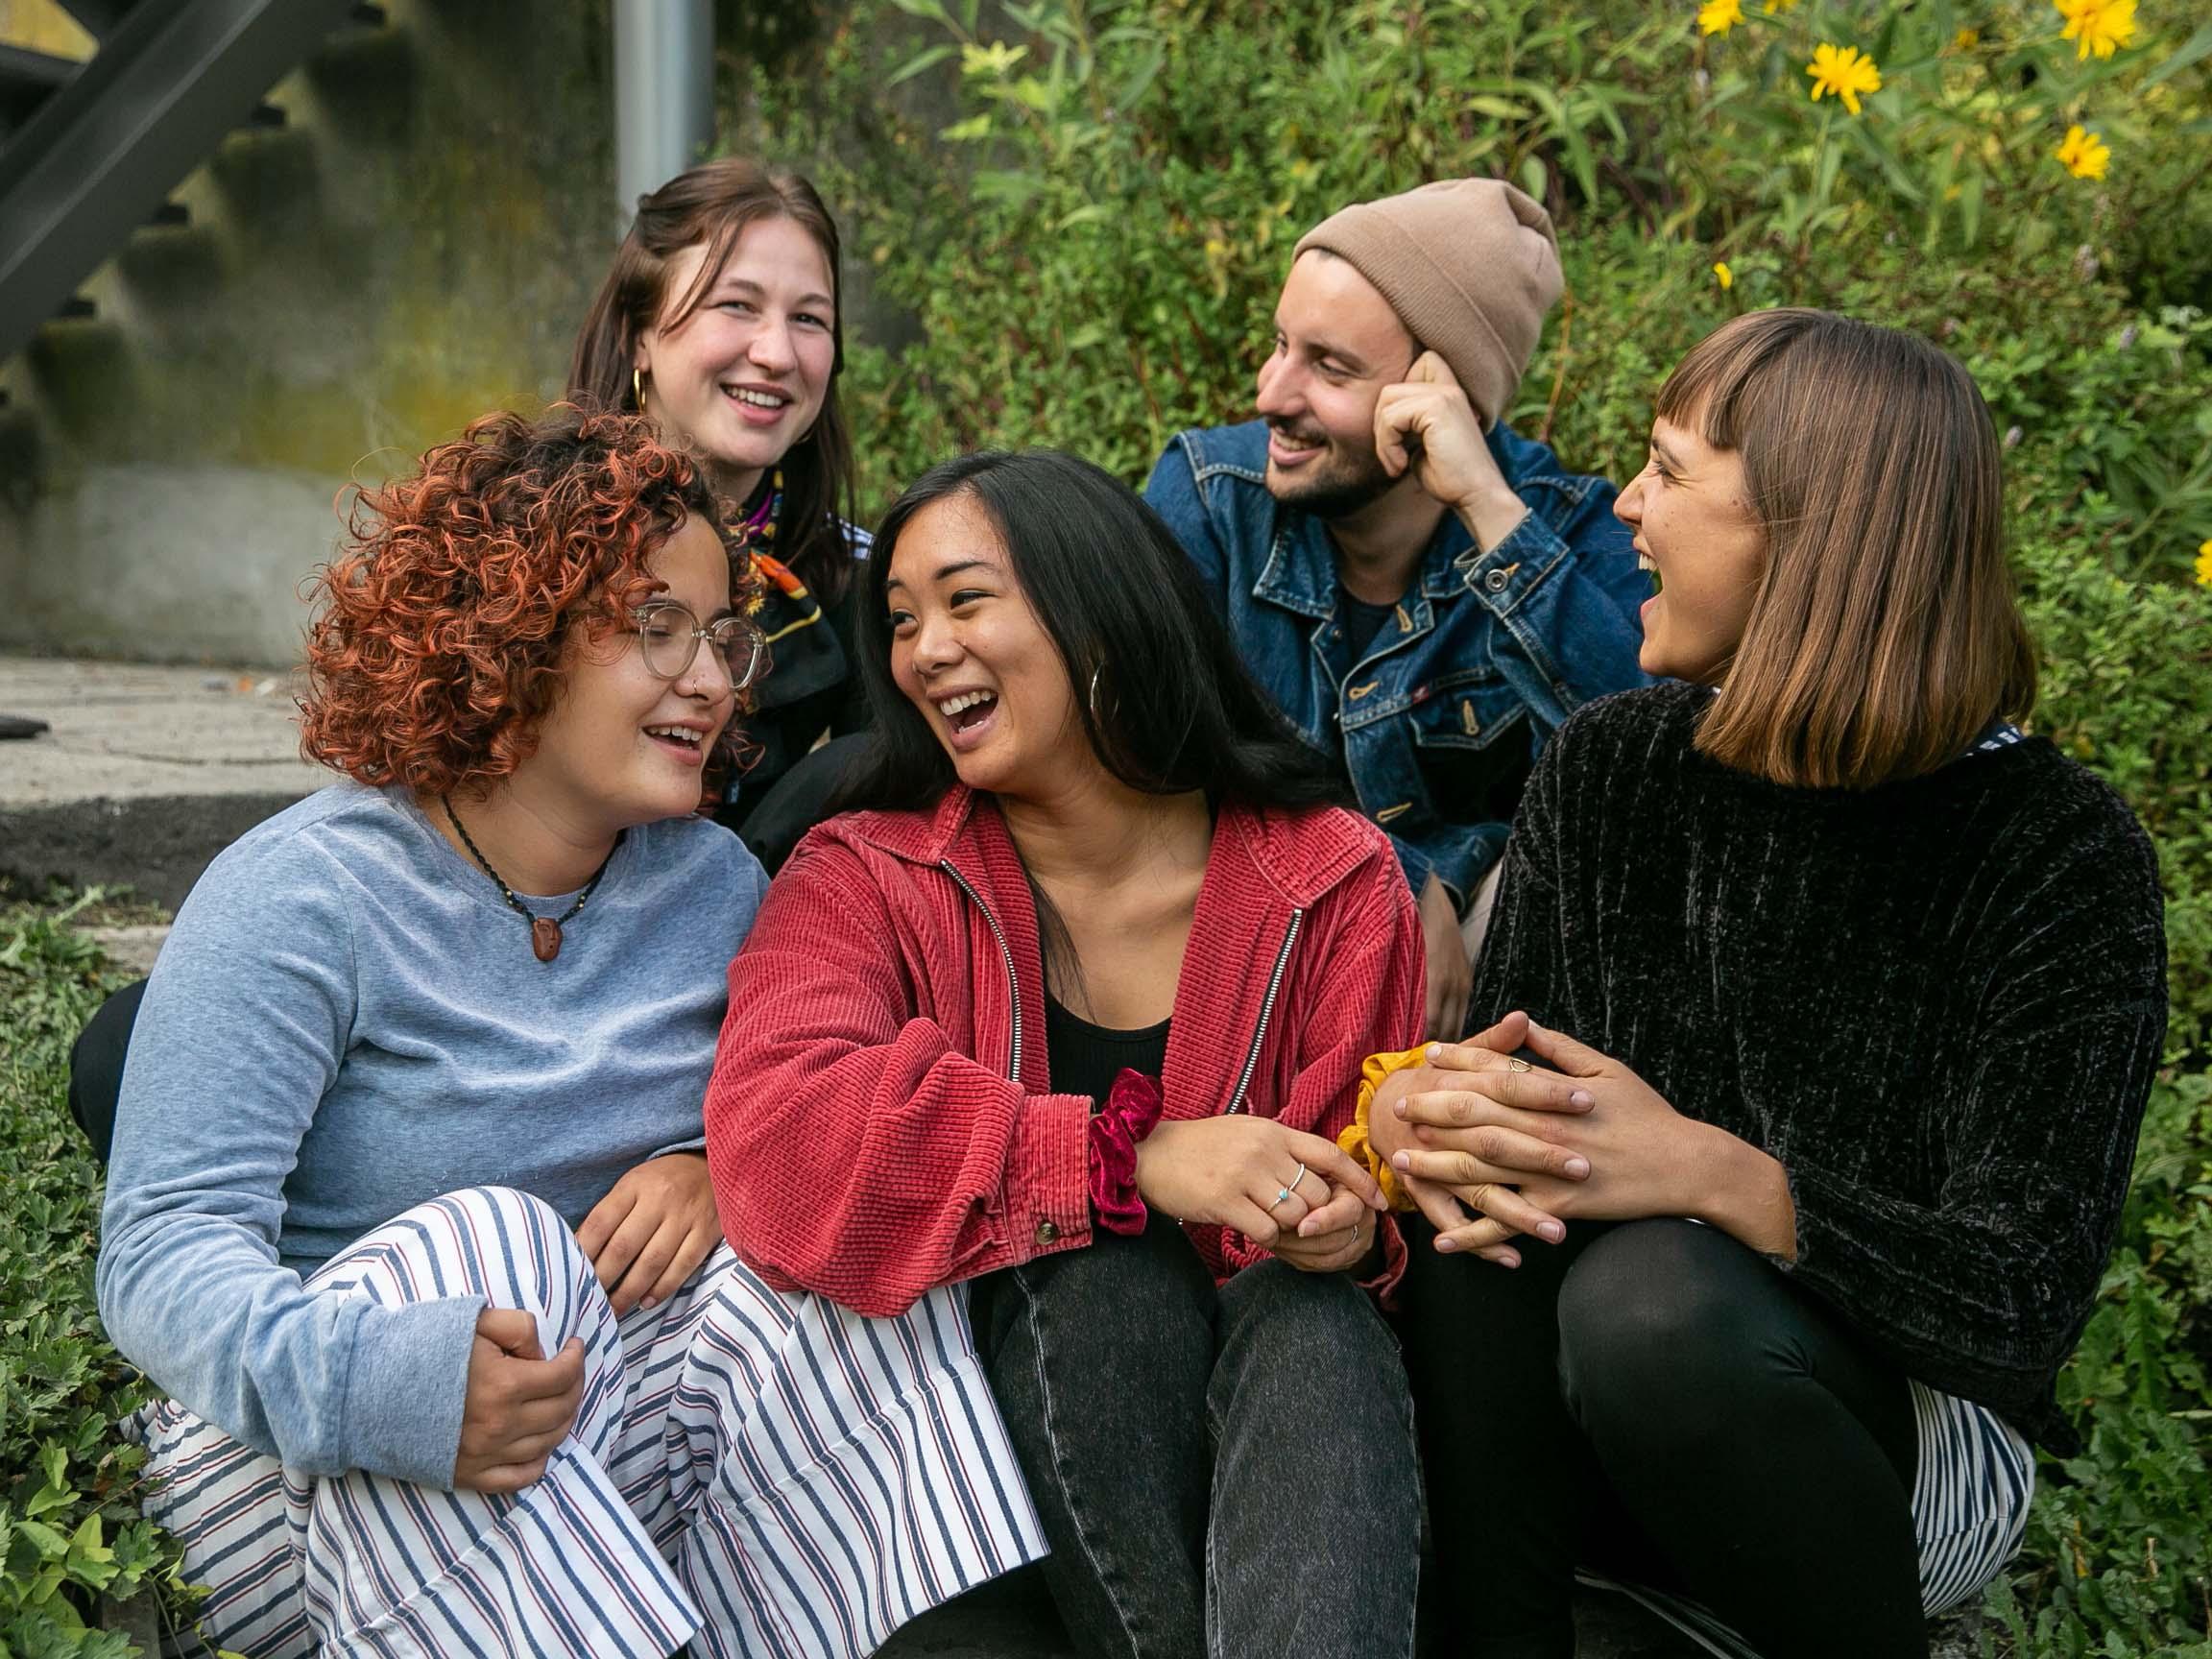 Die fünf Jugendarbeitenden der JAH; unten v.l.n.r. Joyce Otazo, Cynthia Honefeld, Sofia Hadjisterkoti, oben v.l.n.r. Hanna von Aesch und Ian Wunderli.